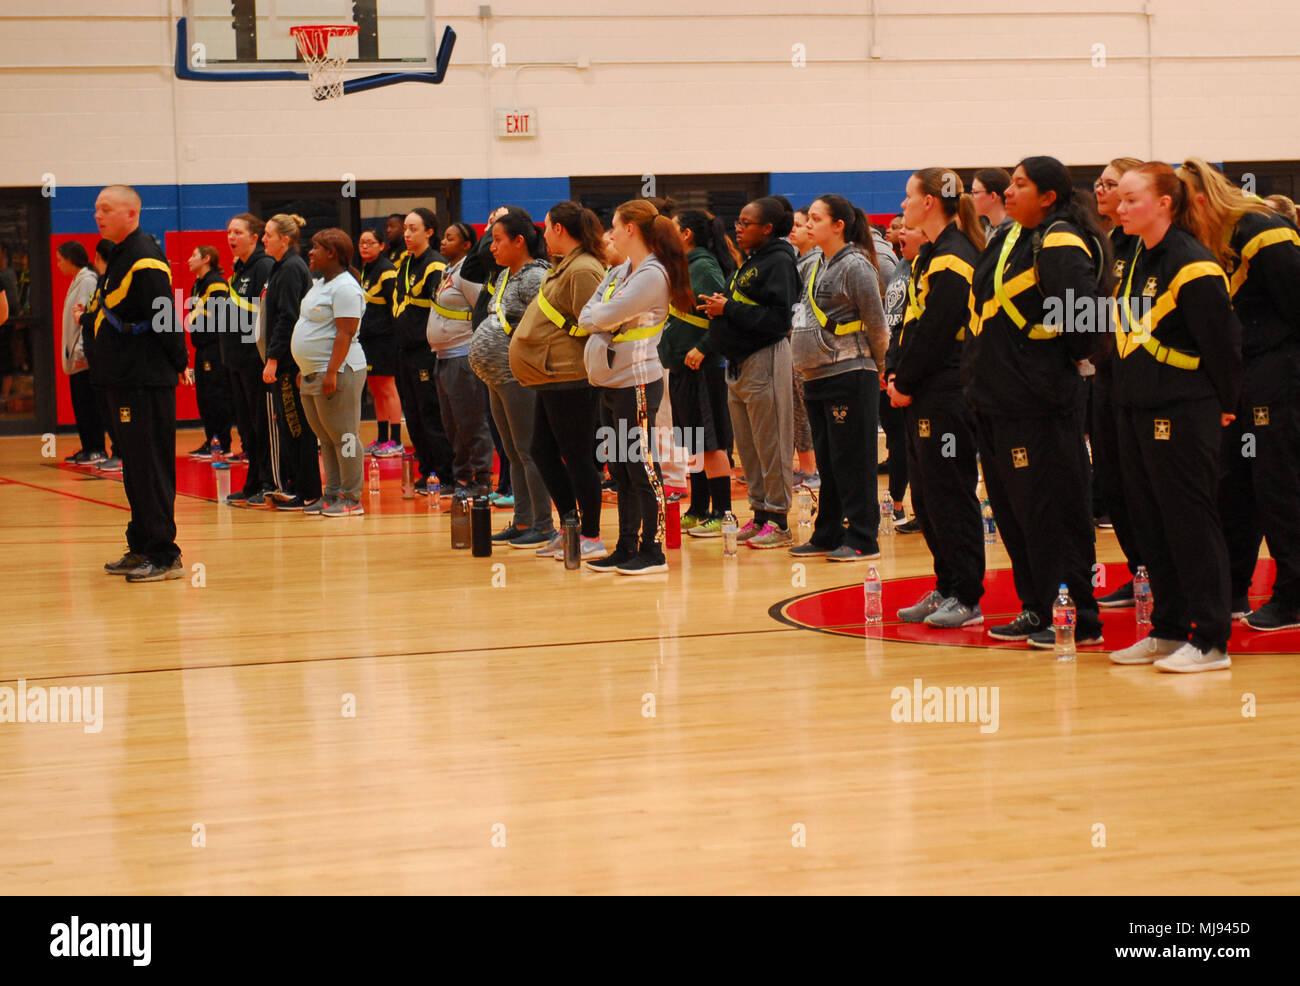 Army Gym Training Stock Photos & Army Gym Training Stock